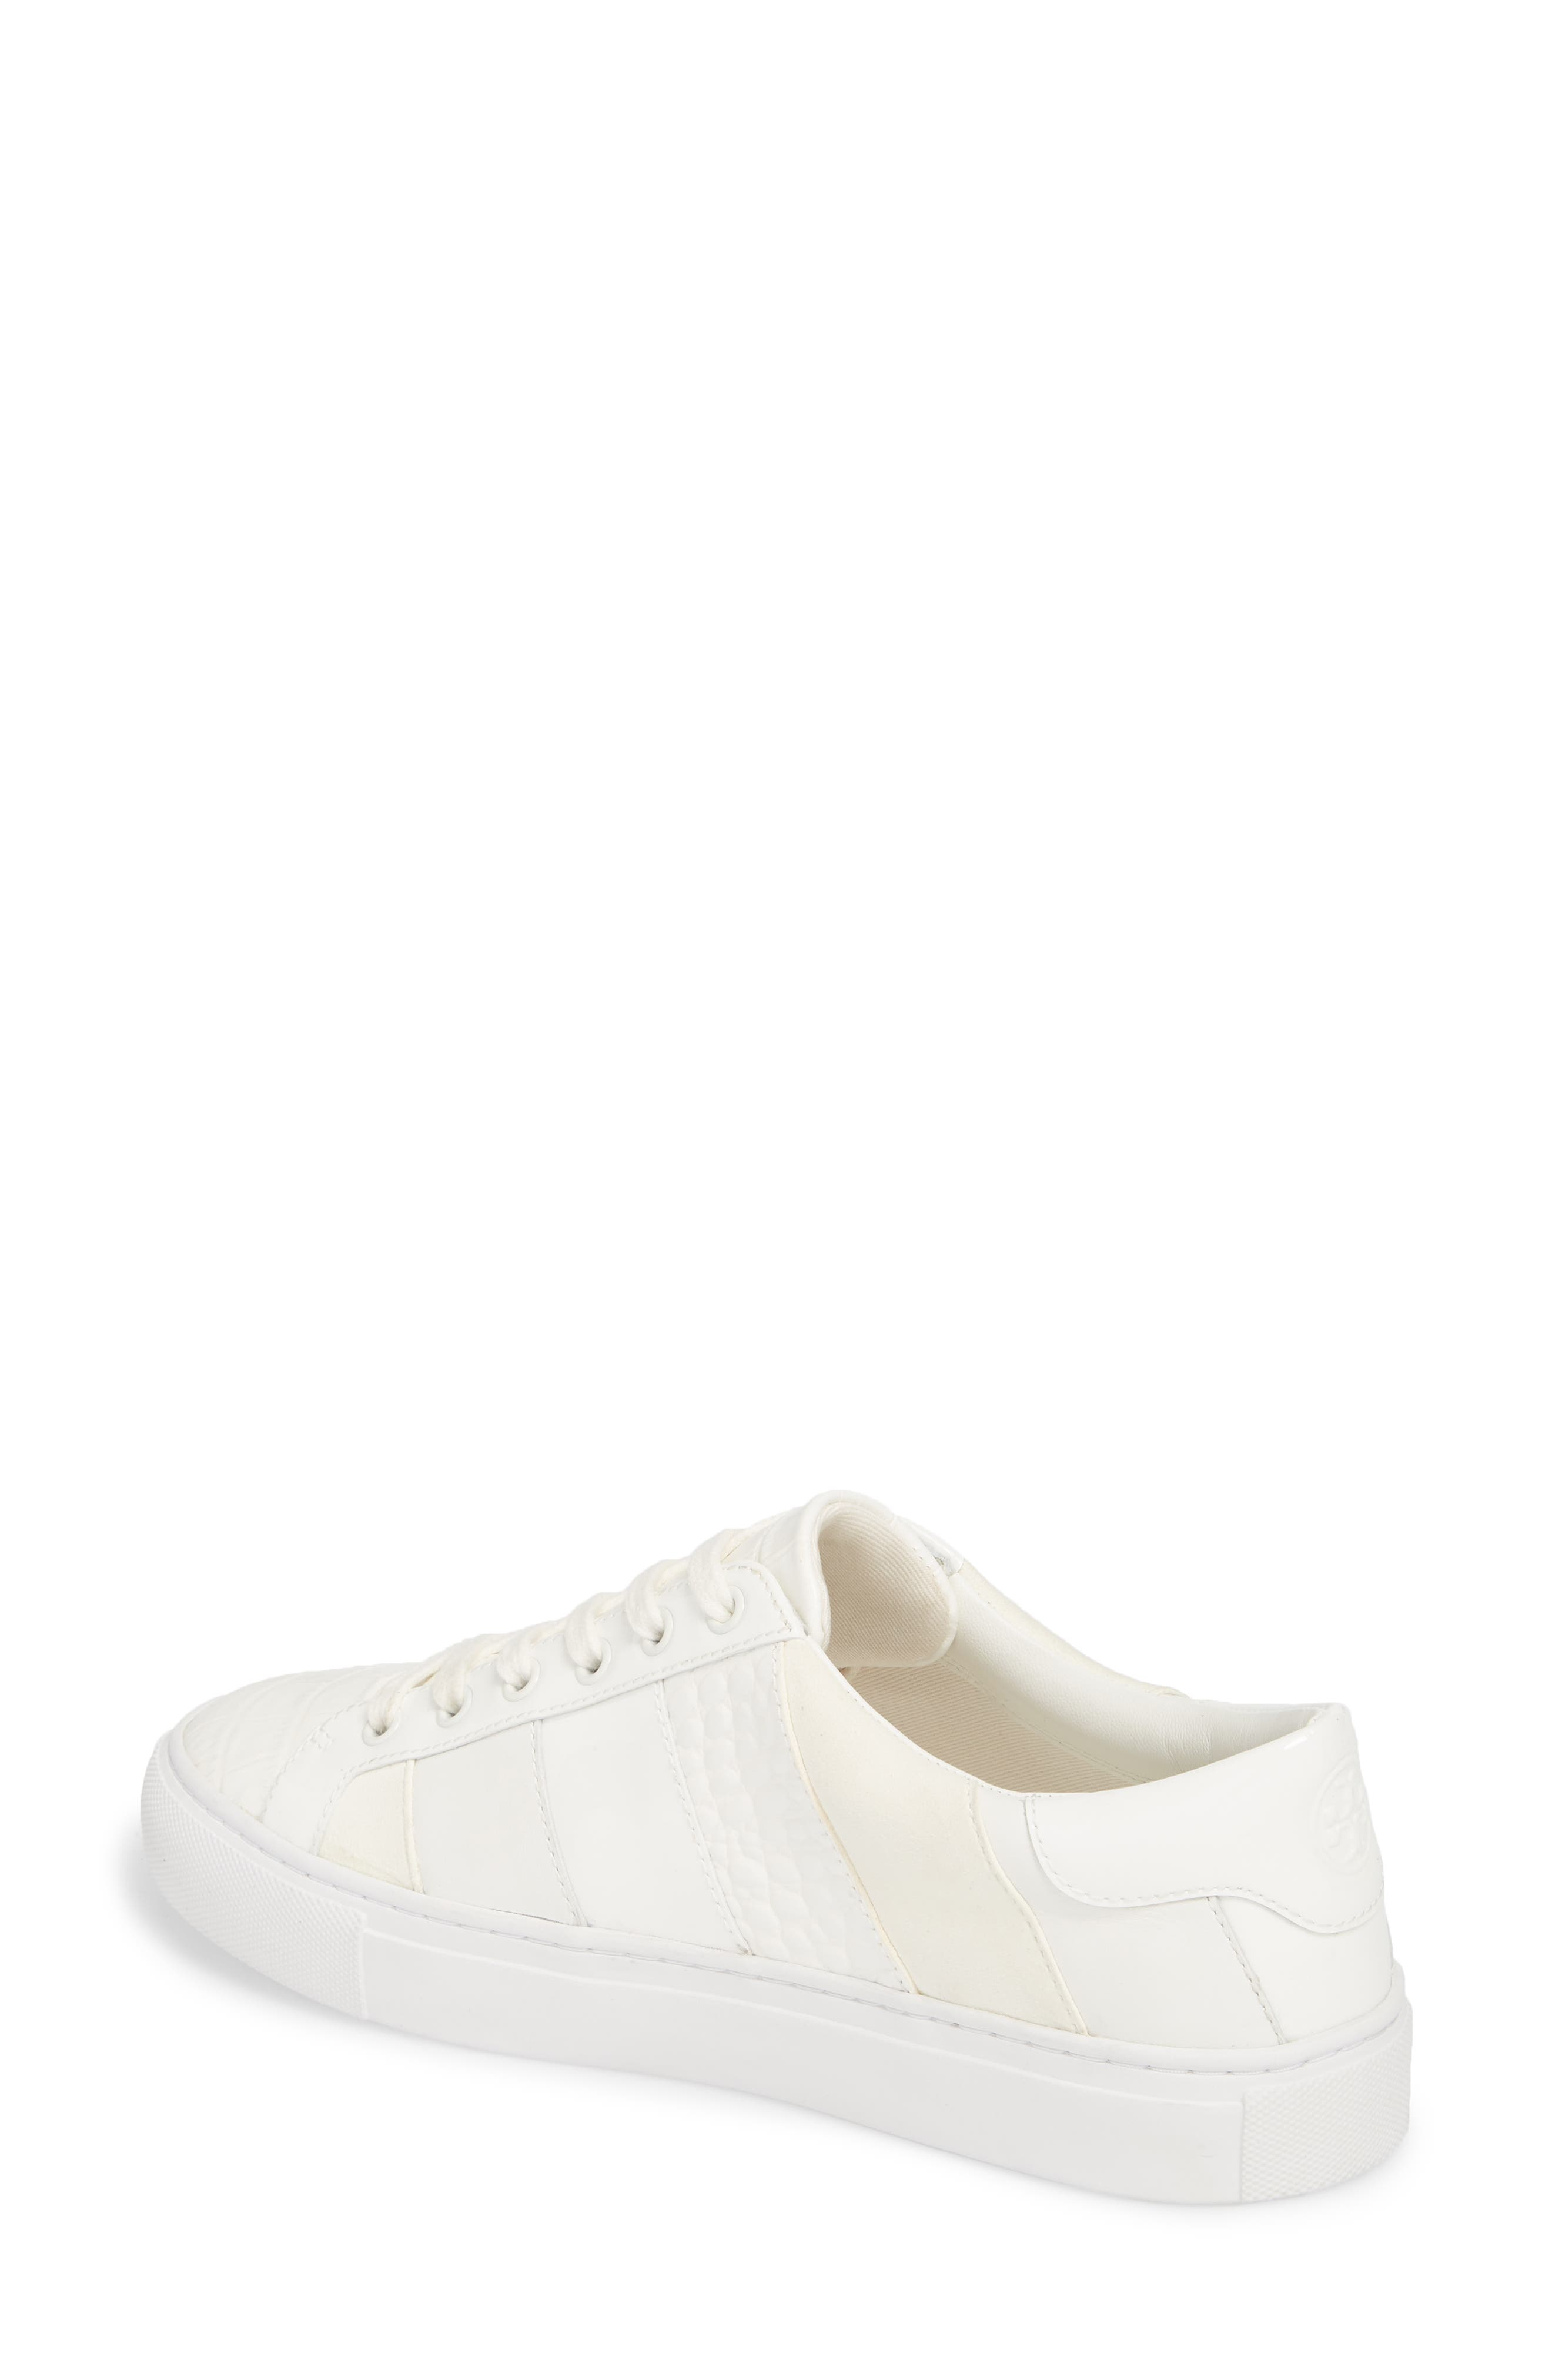 Ames Sneaker,                             Alternate thumbnail 2, color,                             SNOW WHITE